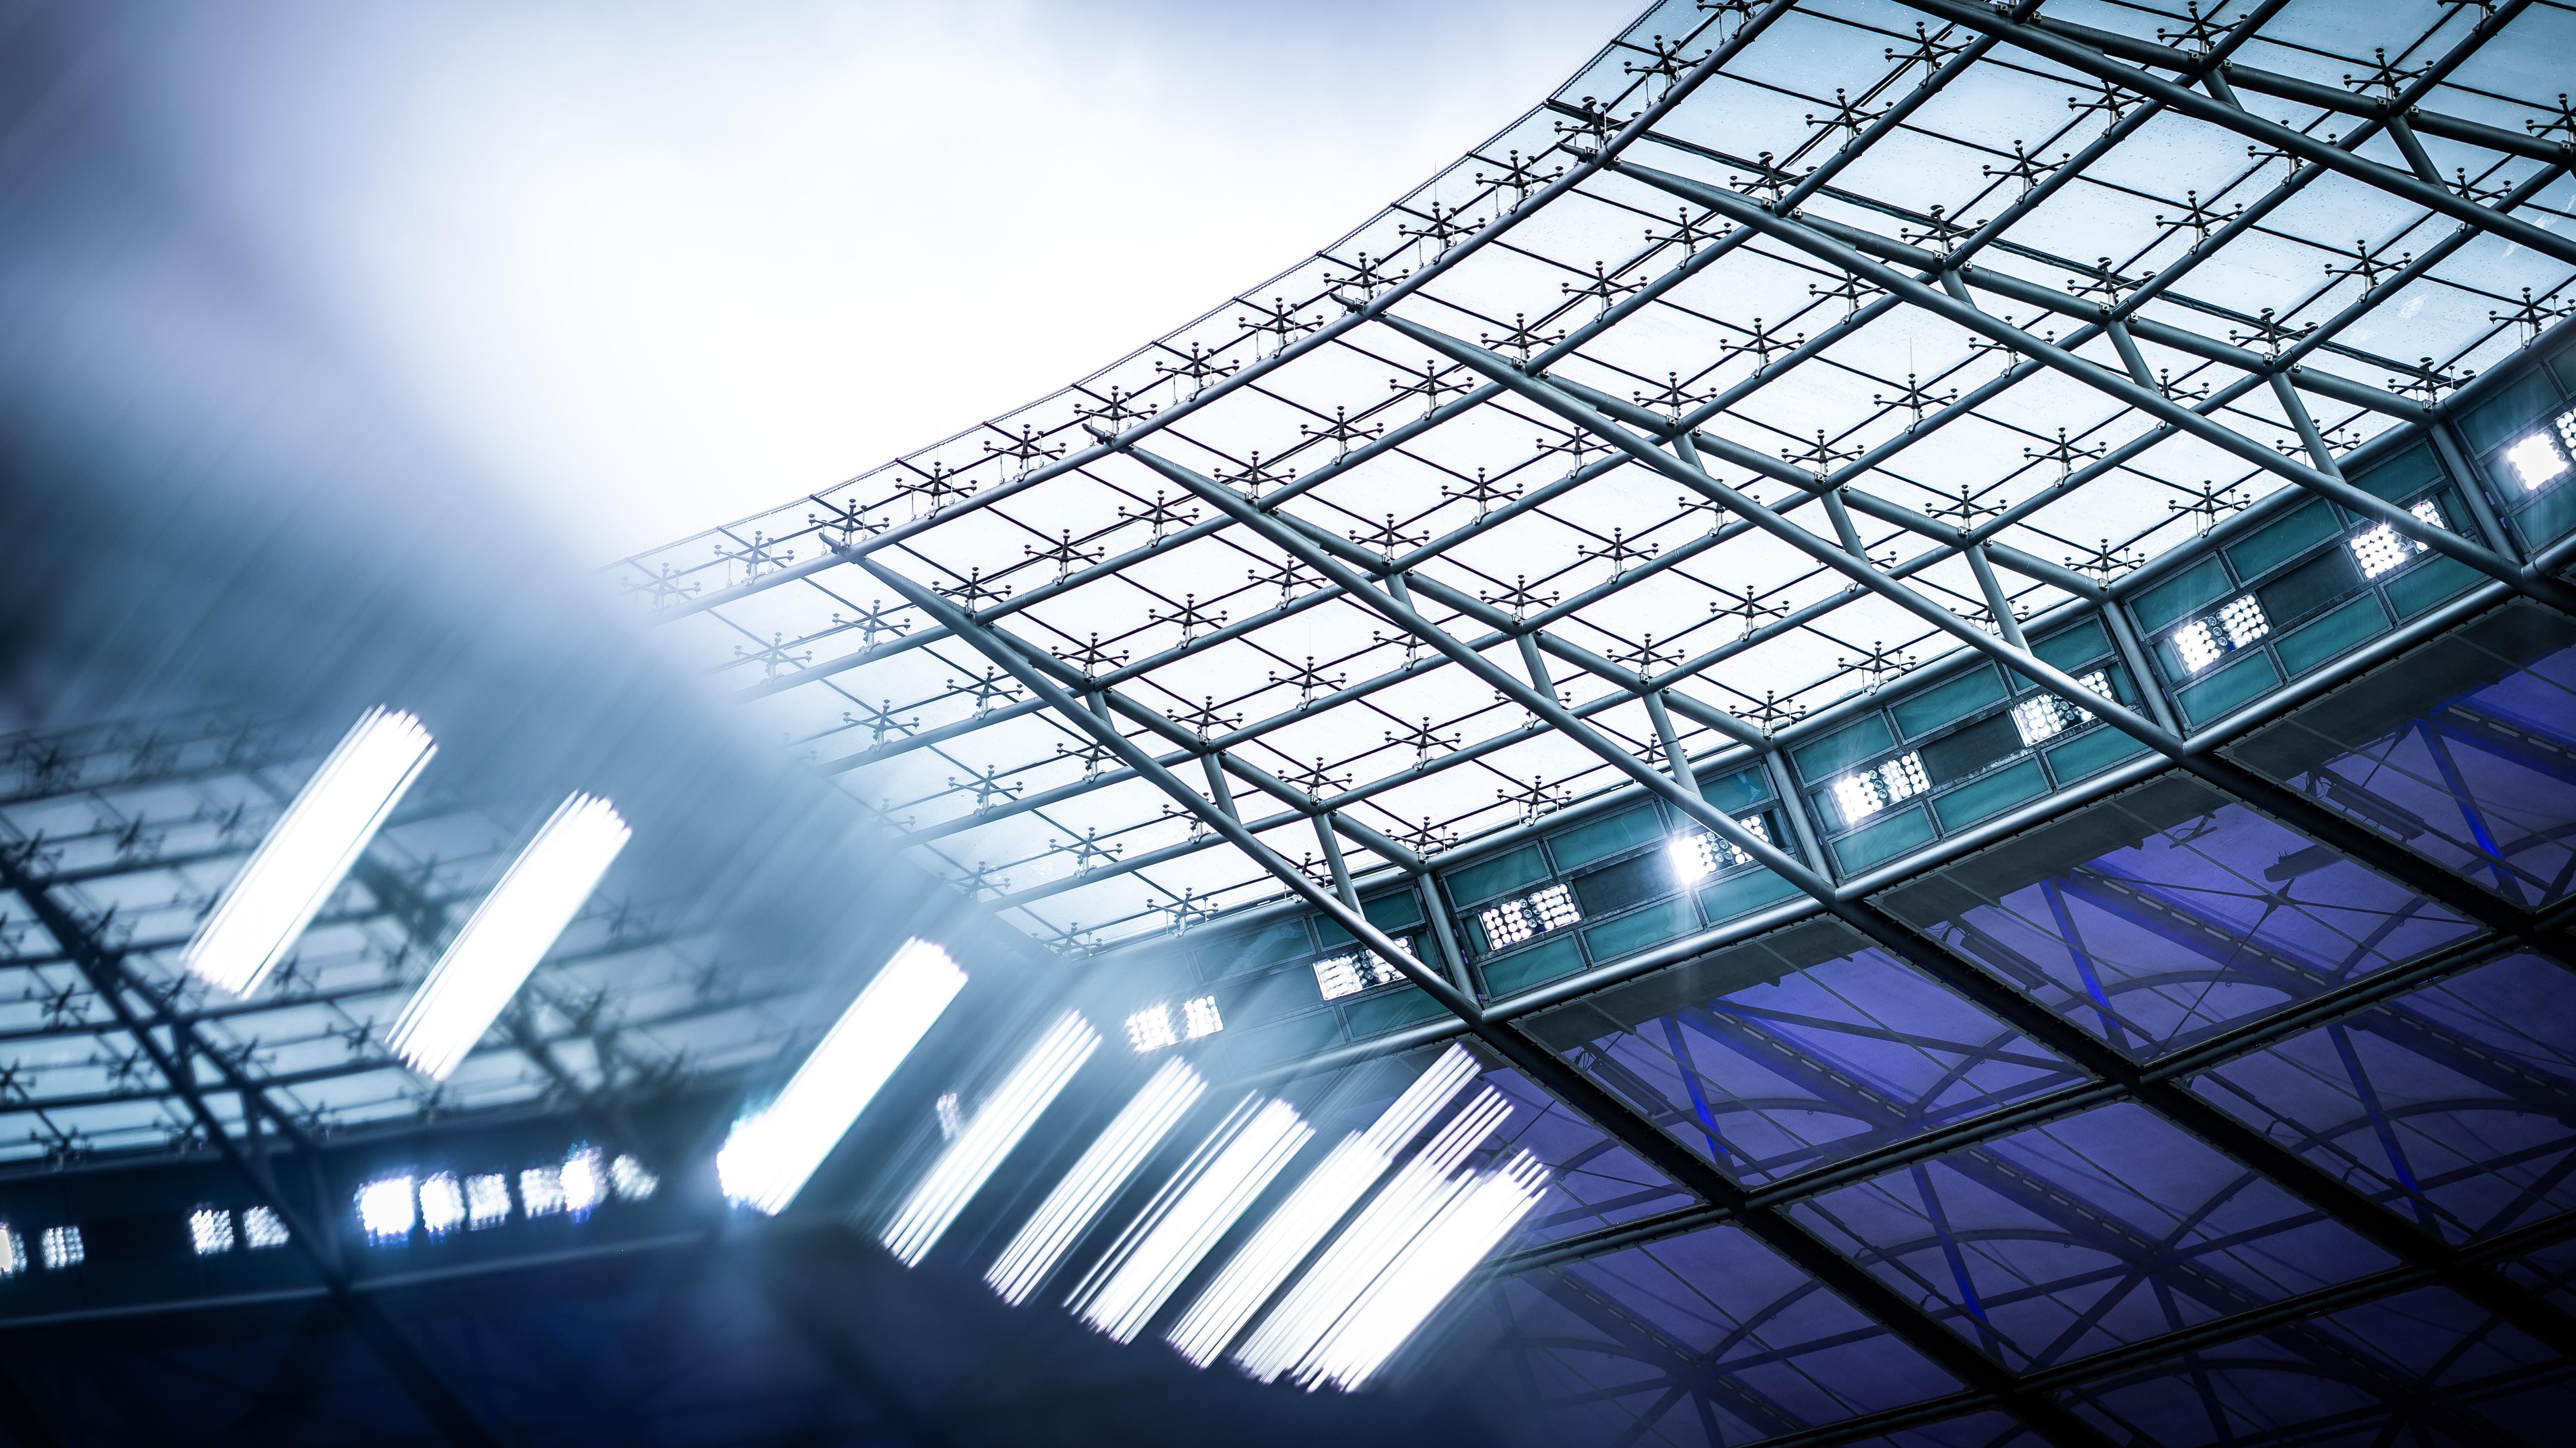 The Olympiastadion